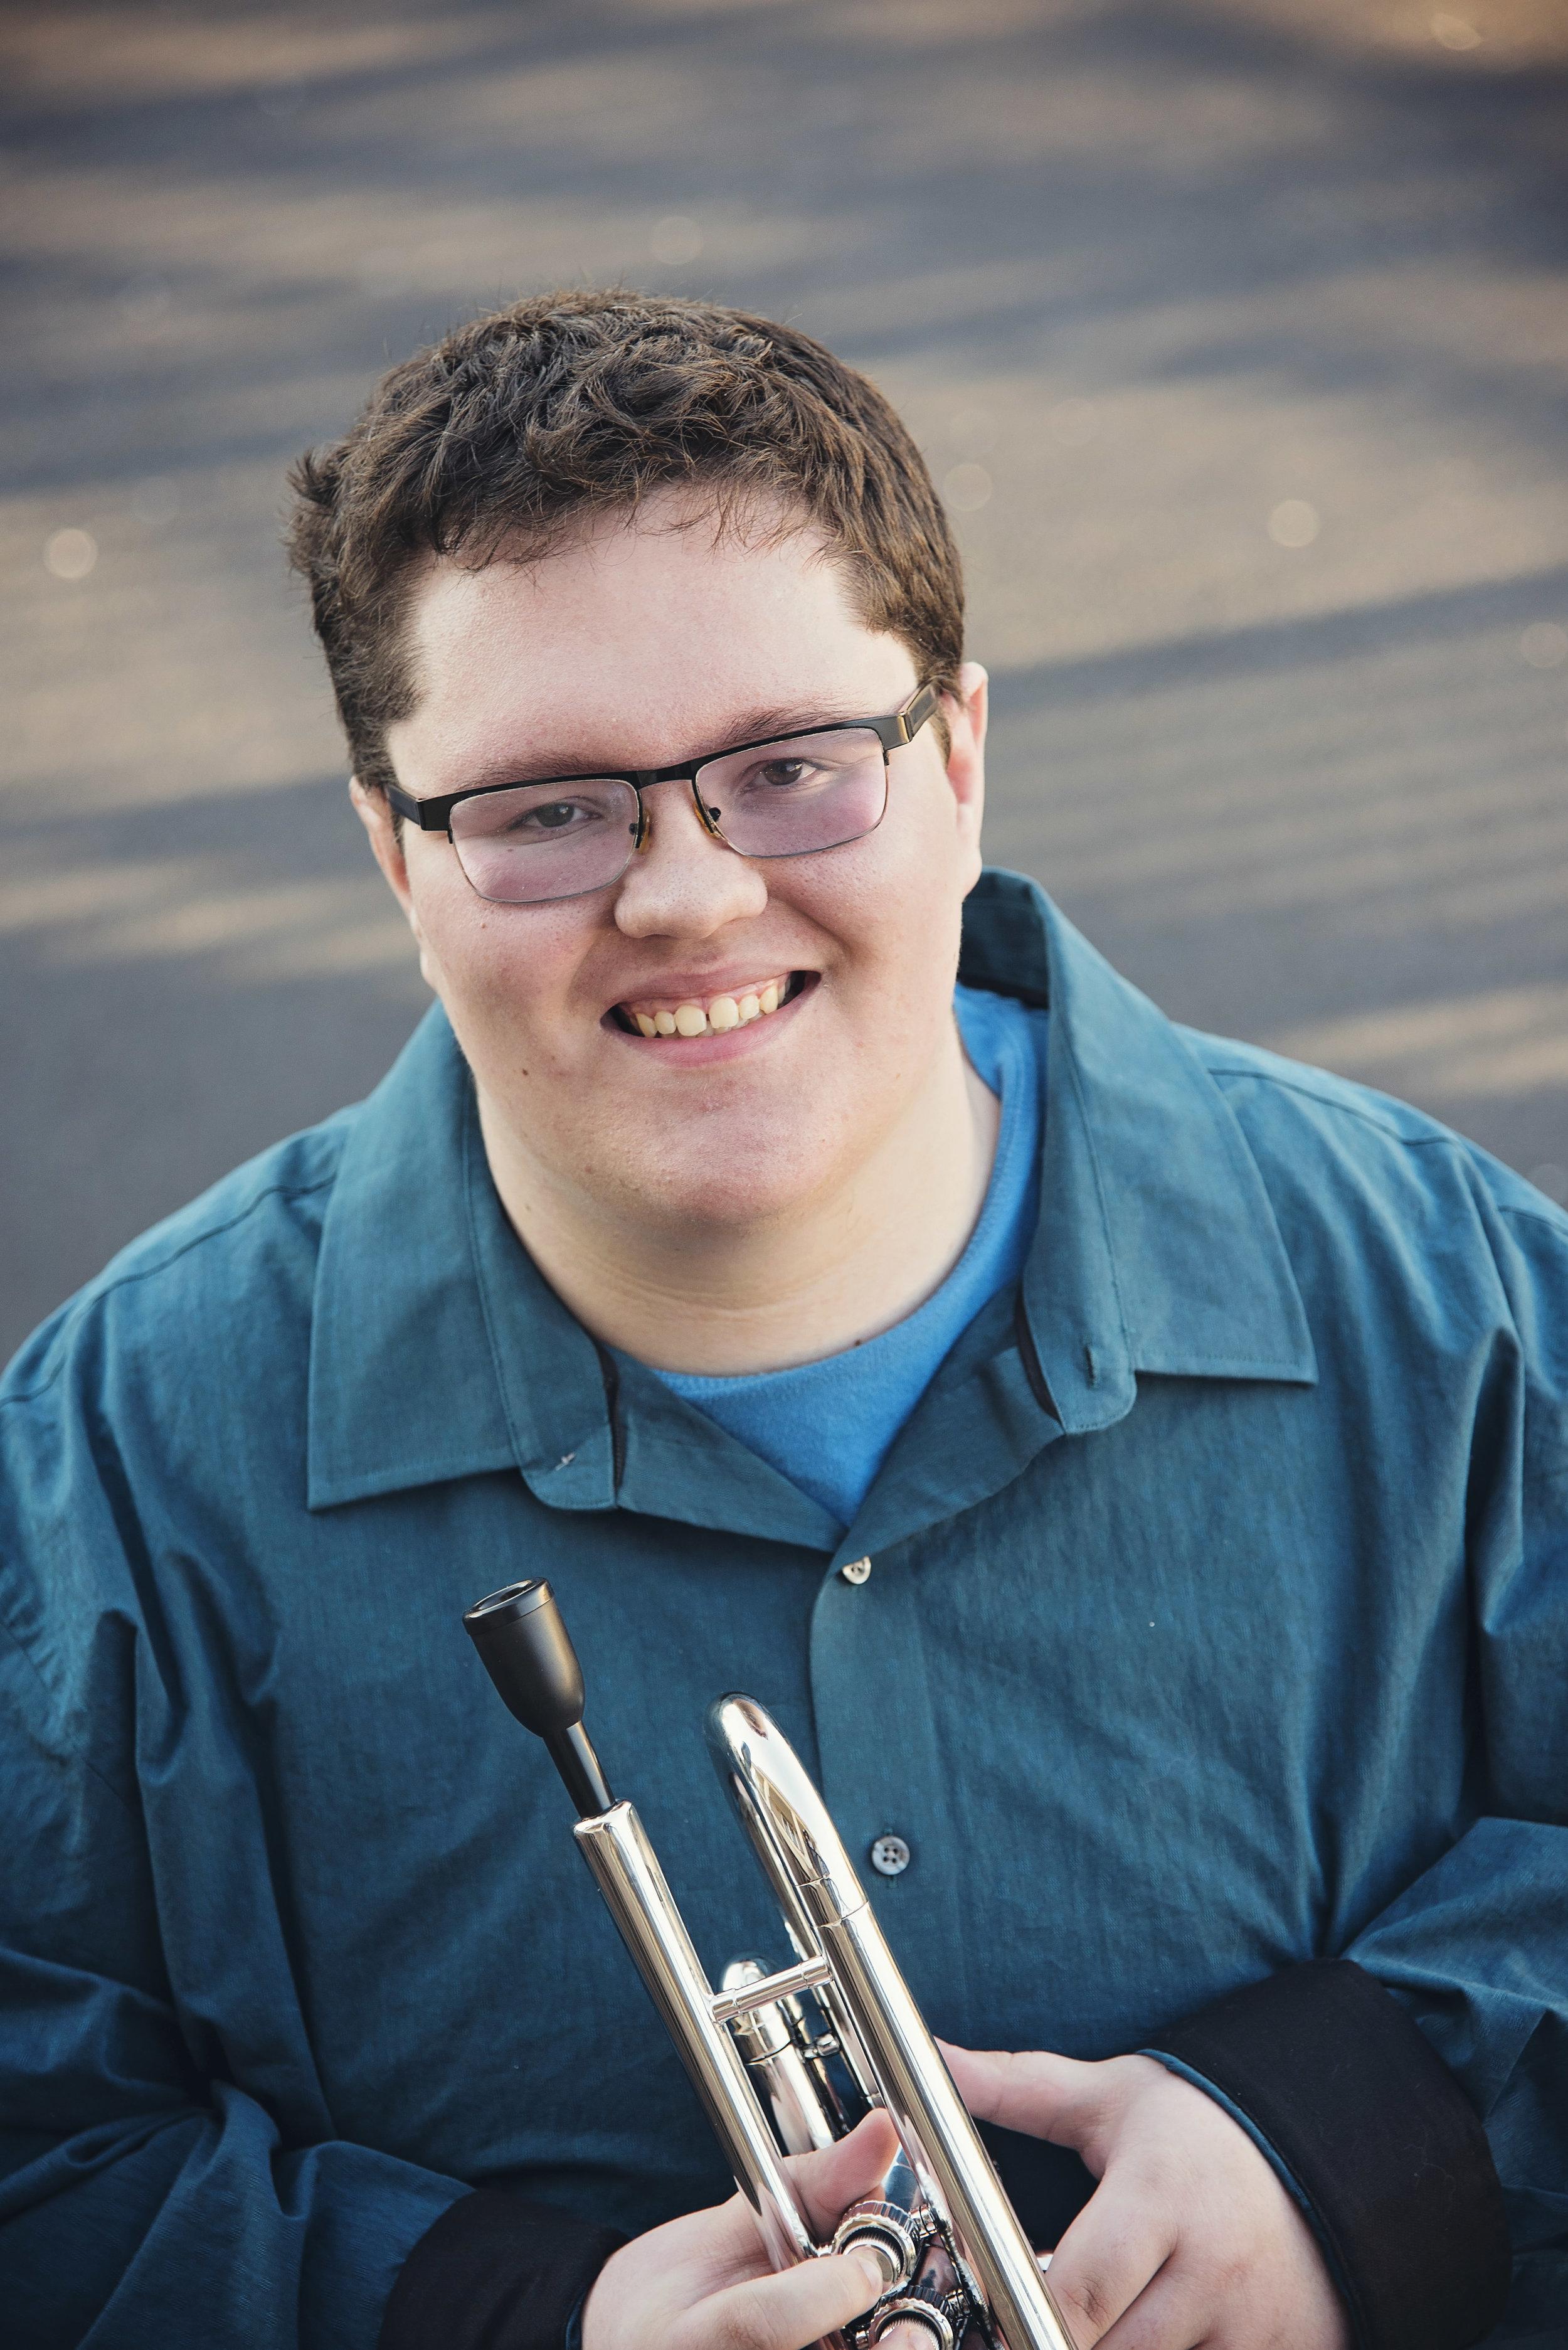 High School Senior Boy holding trumpet Remember When Portraits Cincinnati Senior Photos